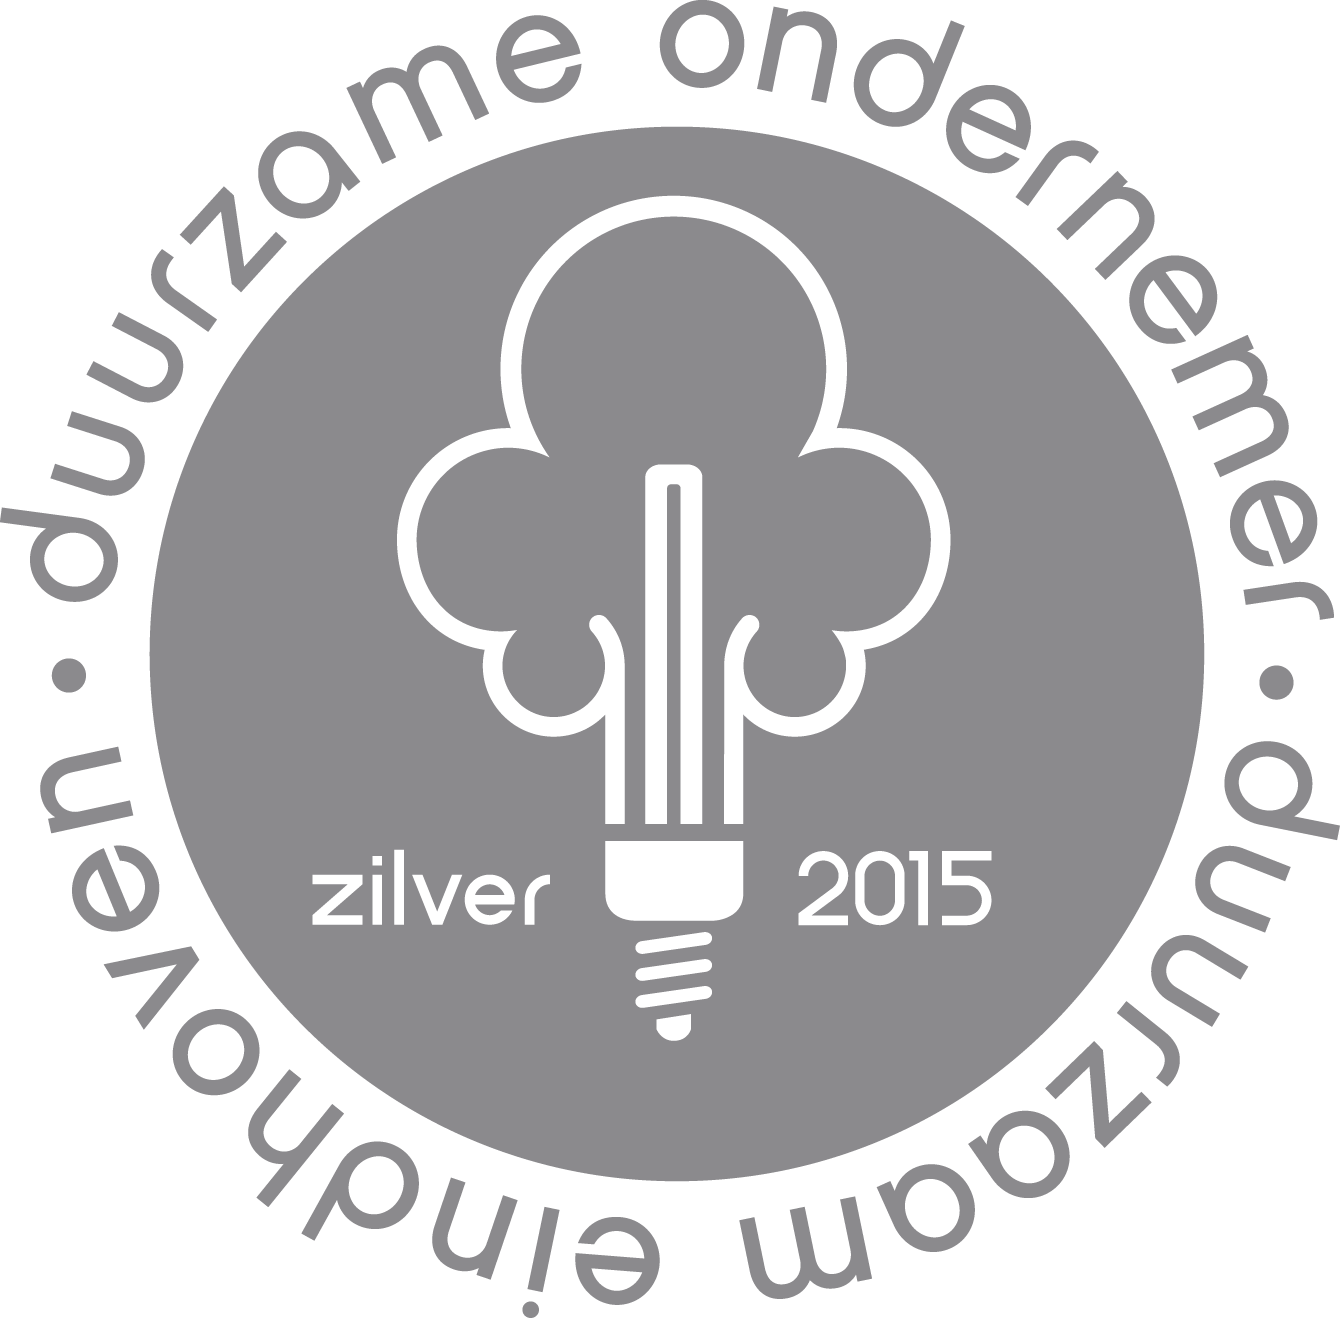 Duurzame ondernemer 2015